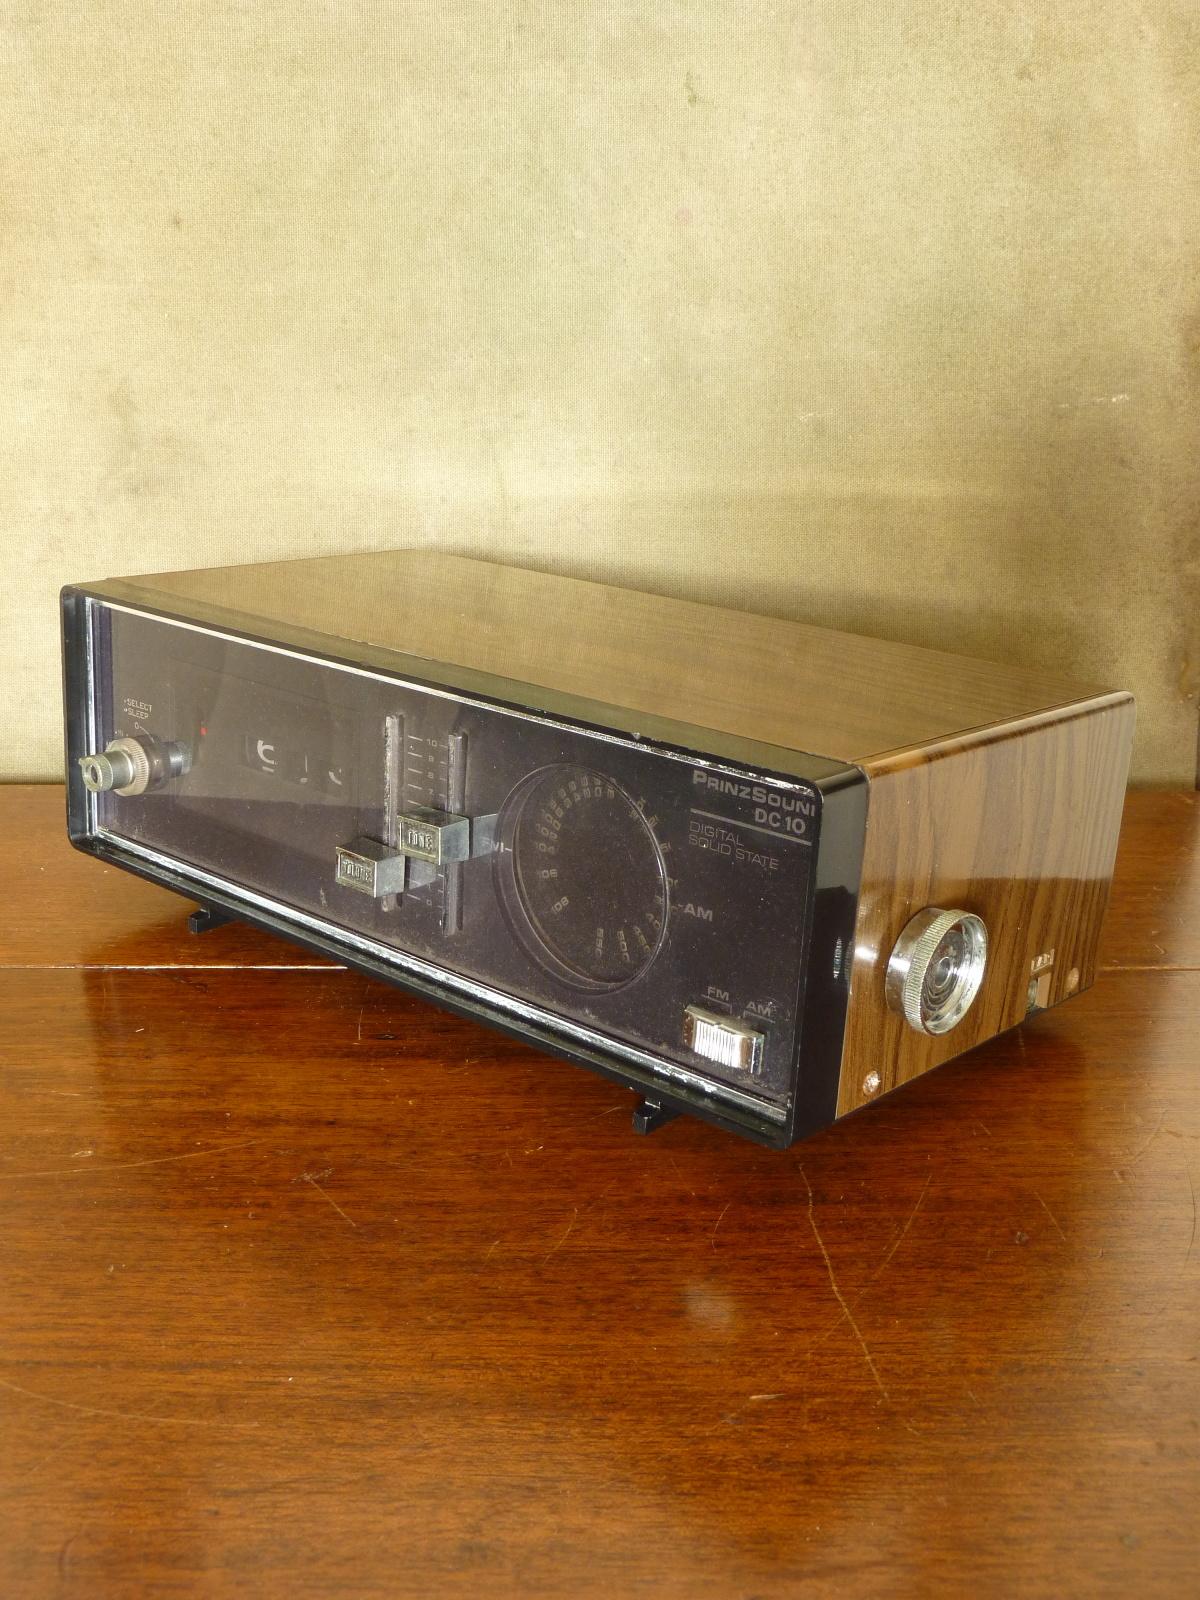 PrinzSound DC10 Digital Solid State AM/FM Radio Roll Roller Clock Alarm